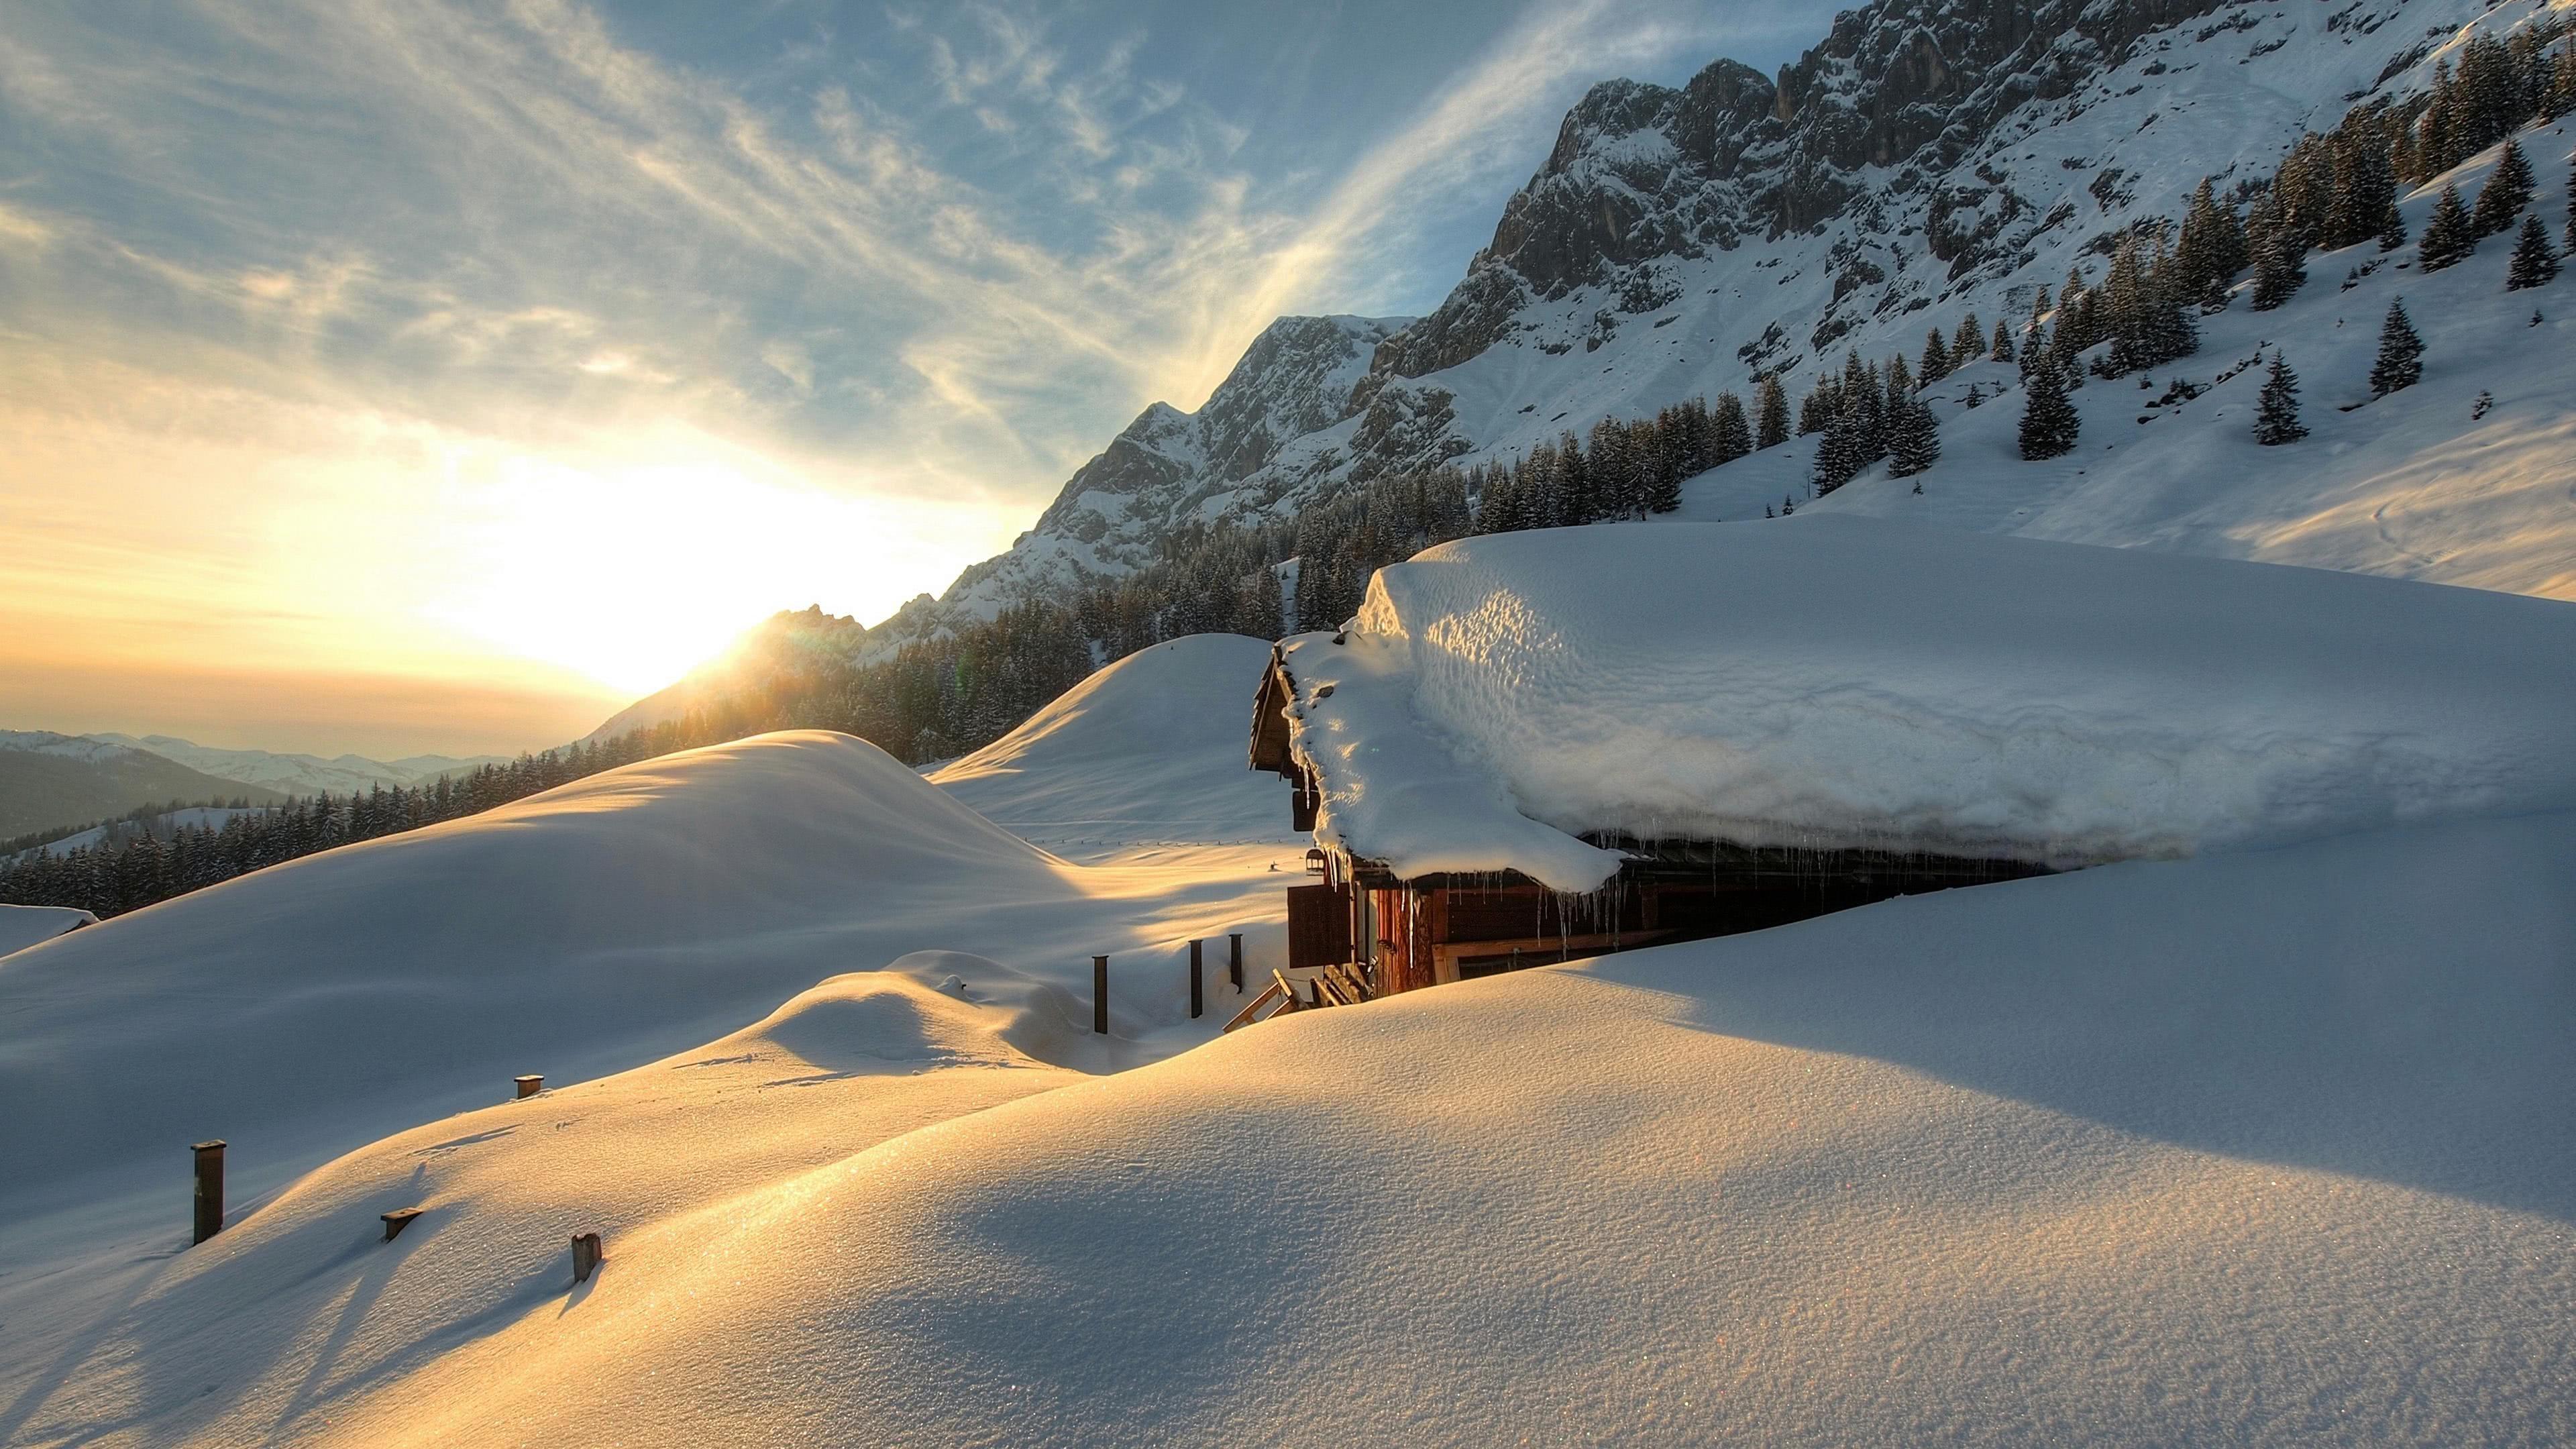 winter mountains in austria uhd 4k wallpaper